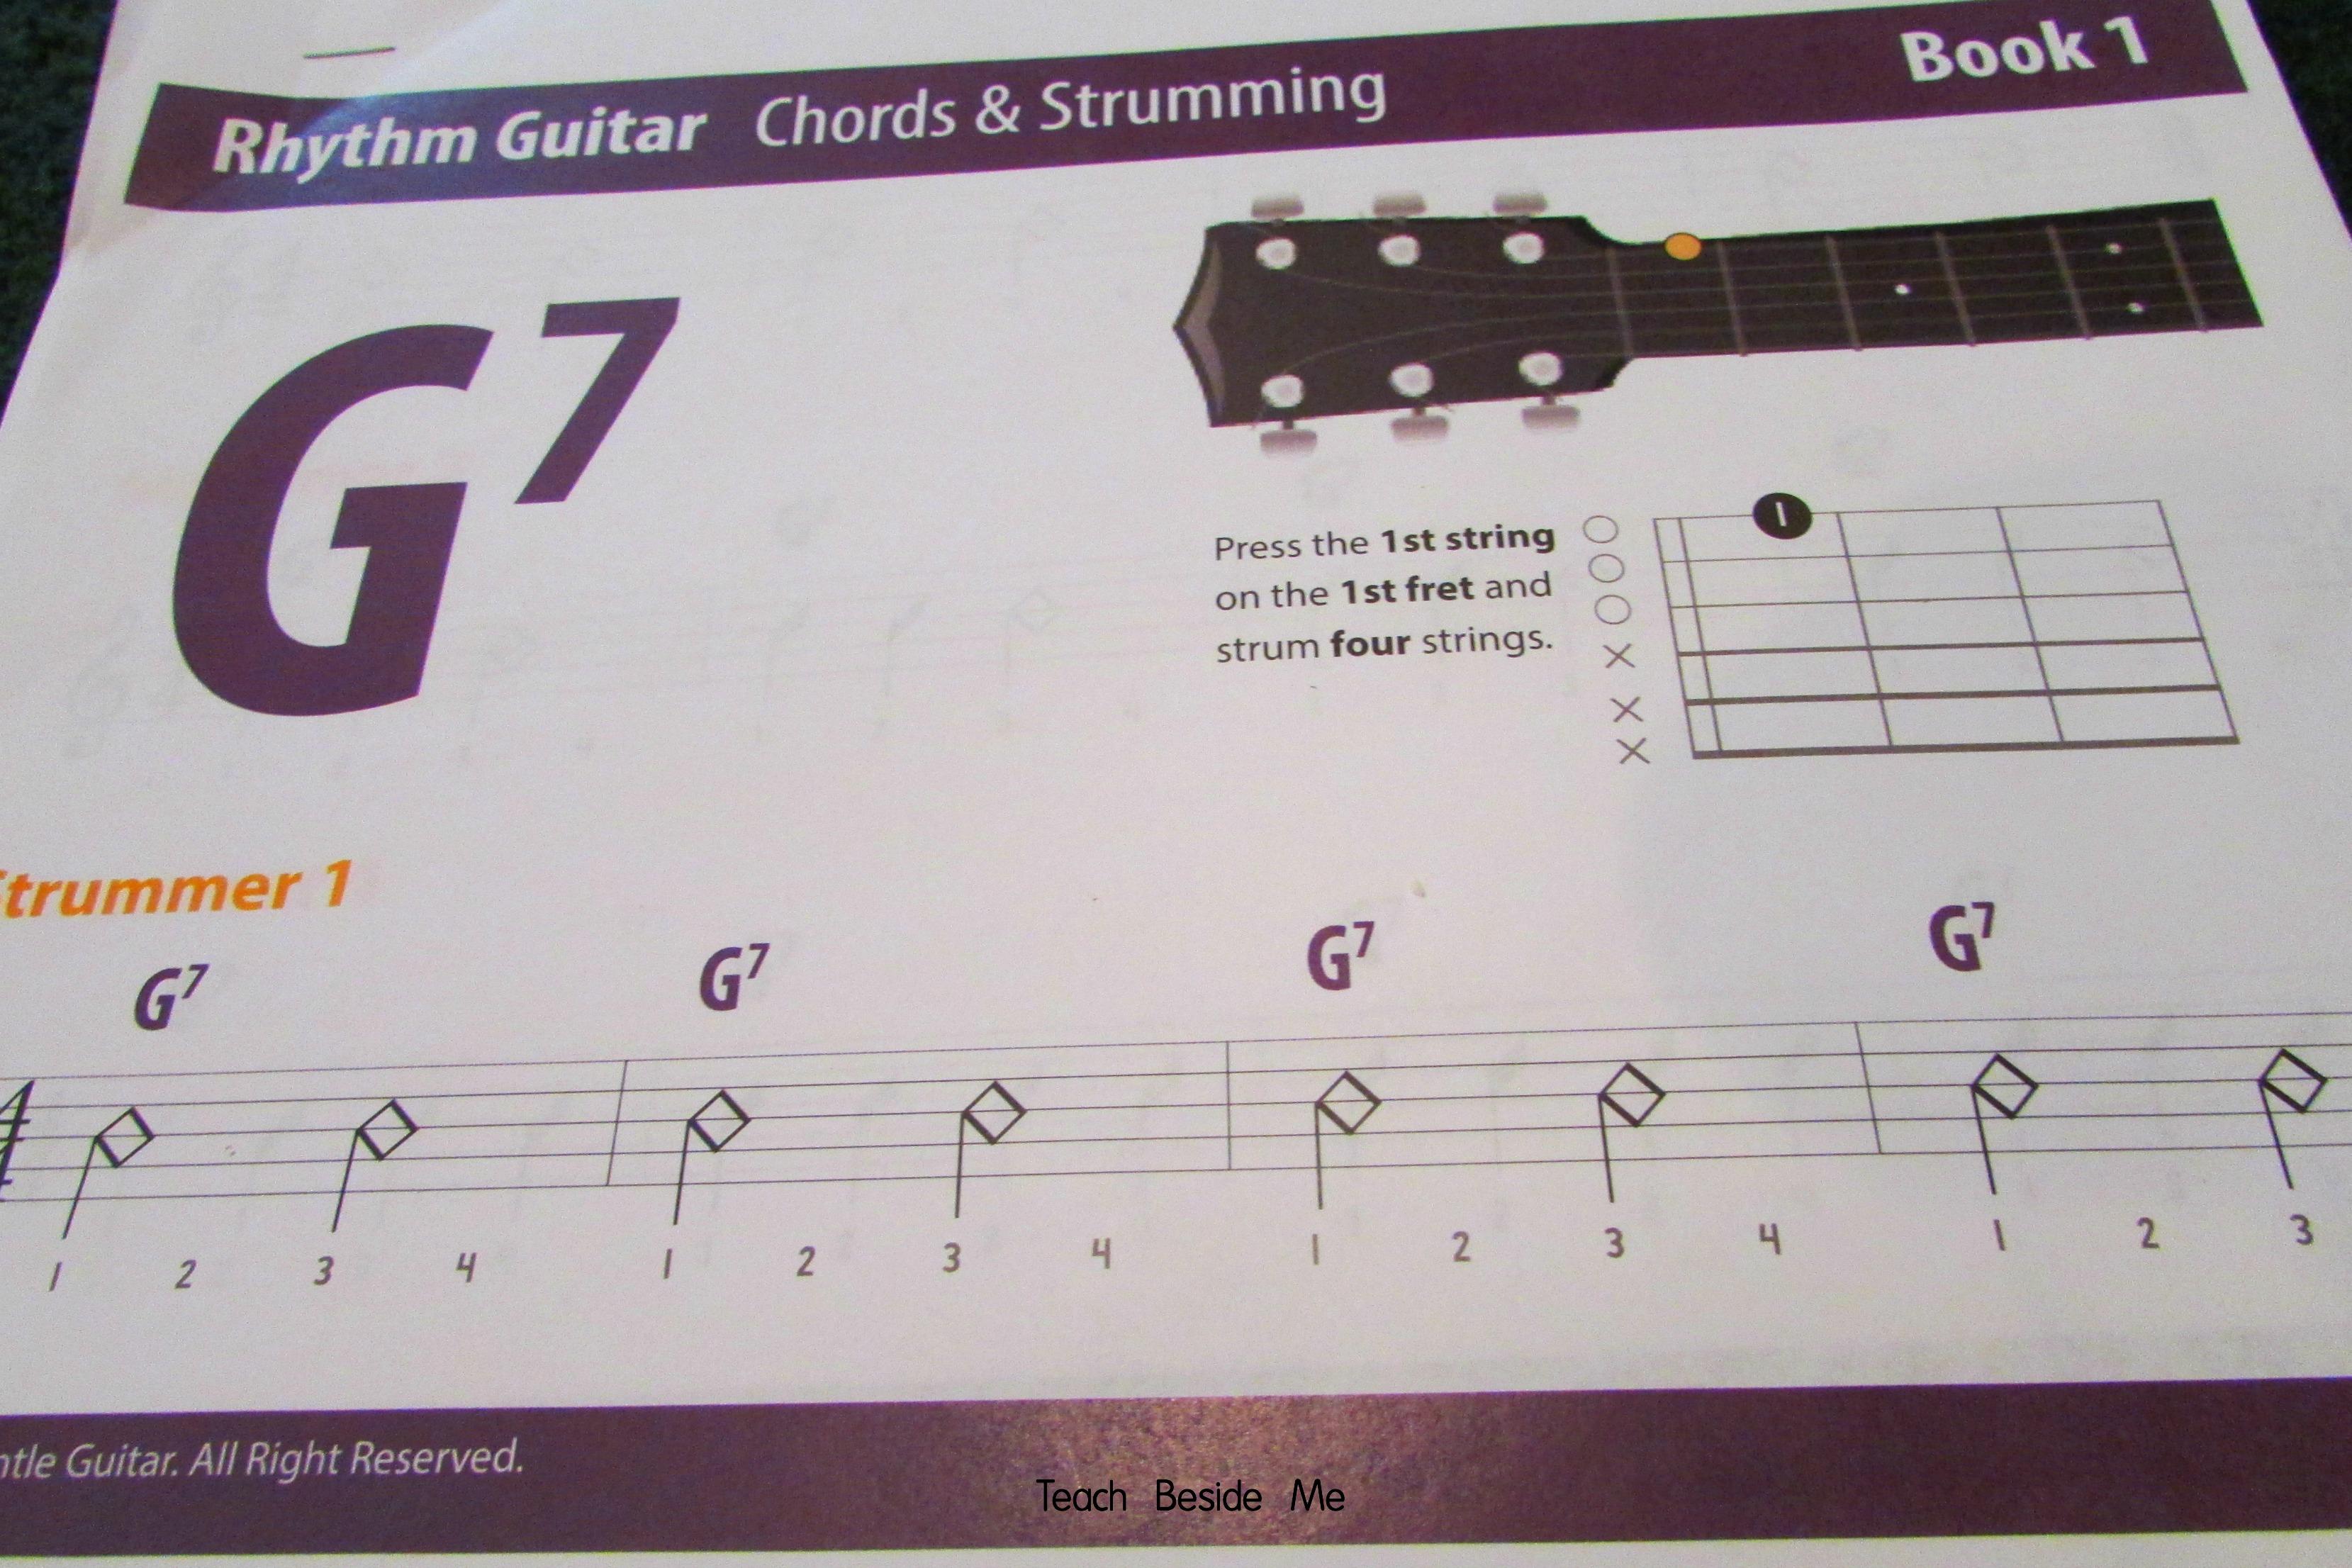 Gentle Guitar lesson book